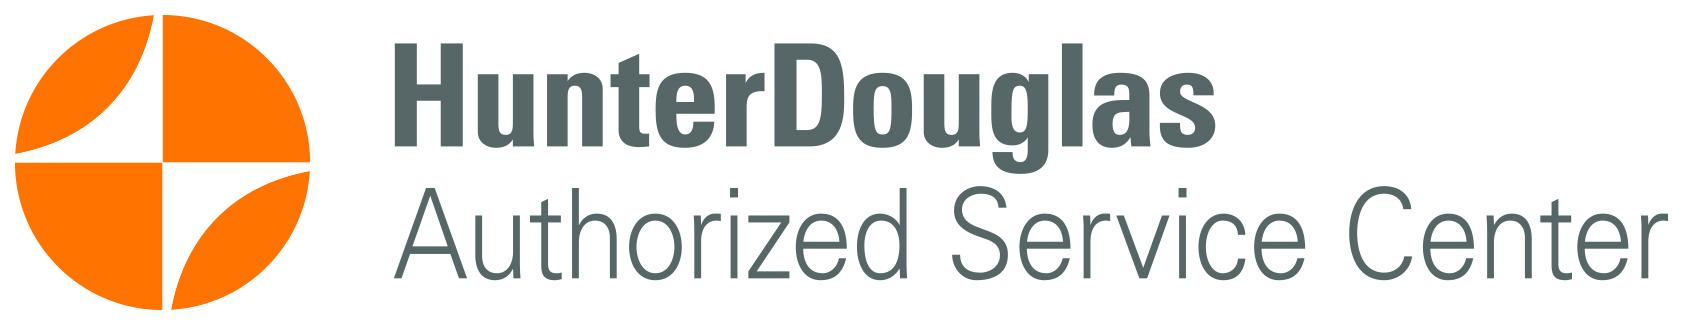 HD_AuthorizedServiceCenter_Logo_H_2colorGray